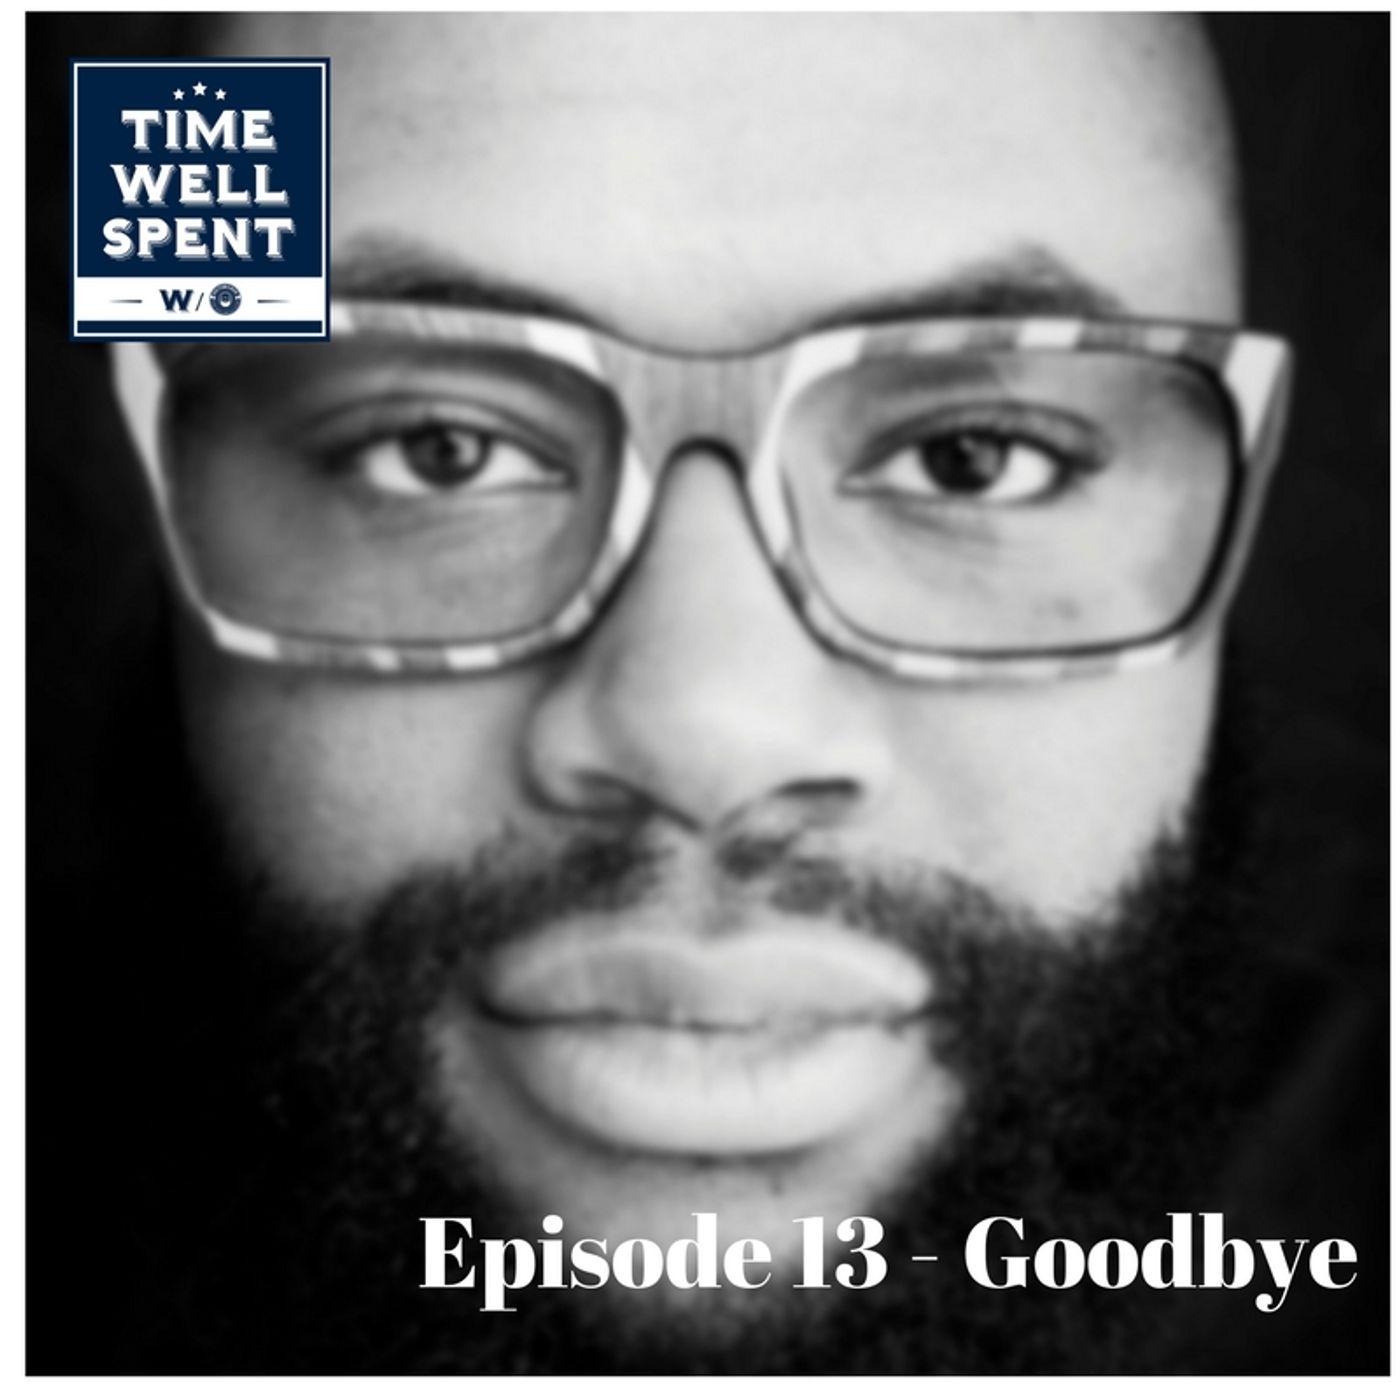 Episode 13 - Goodbye